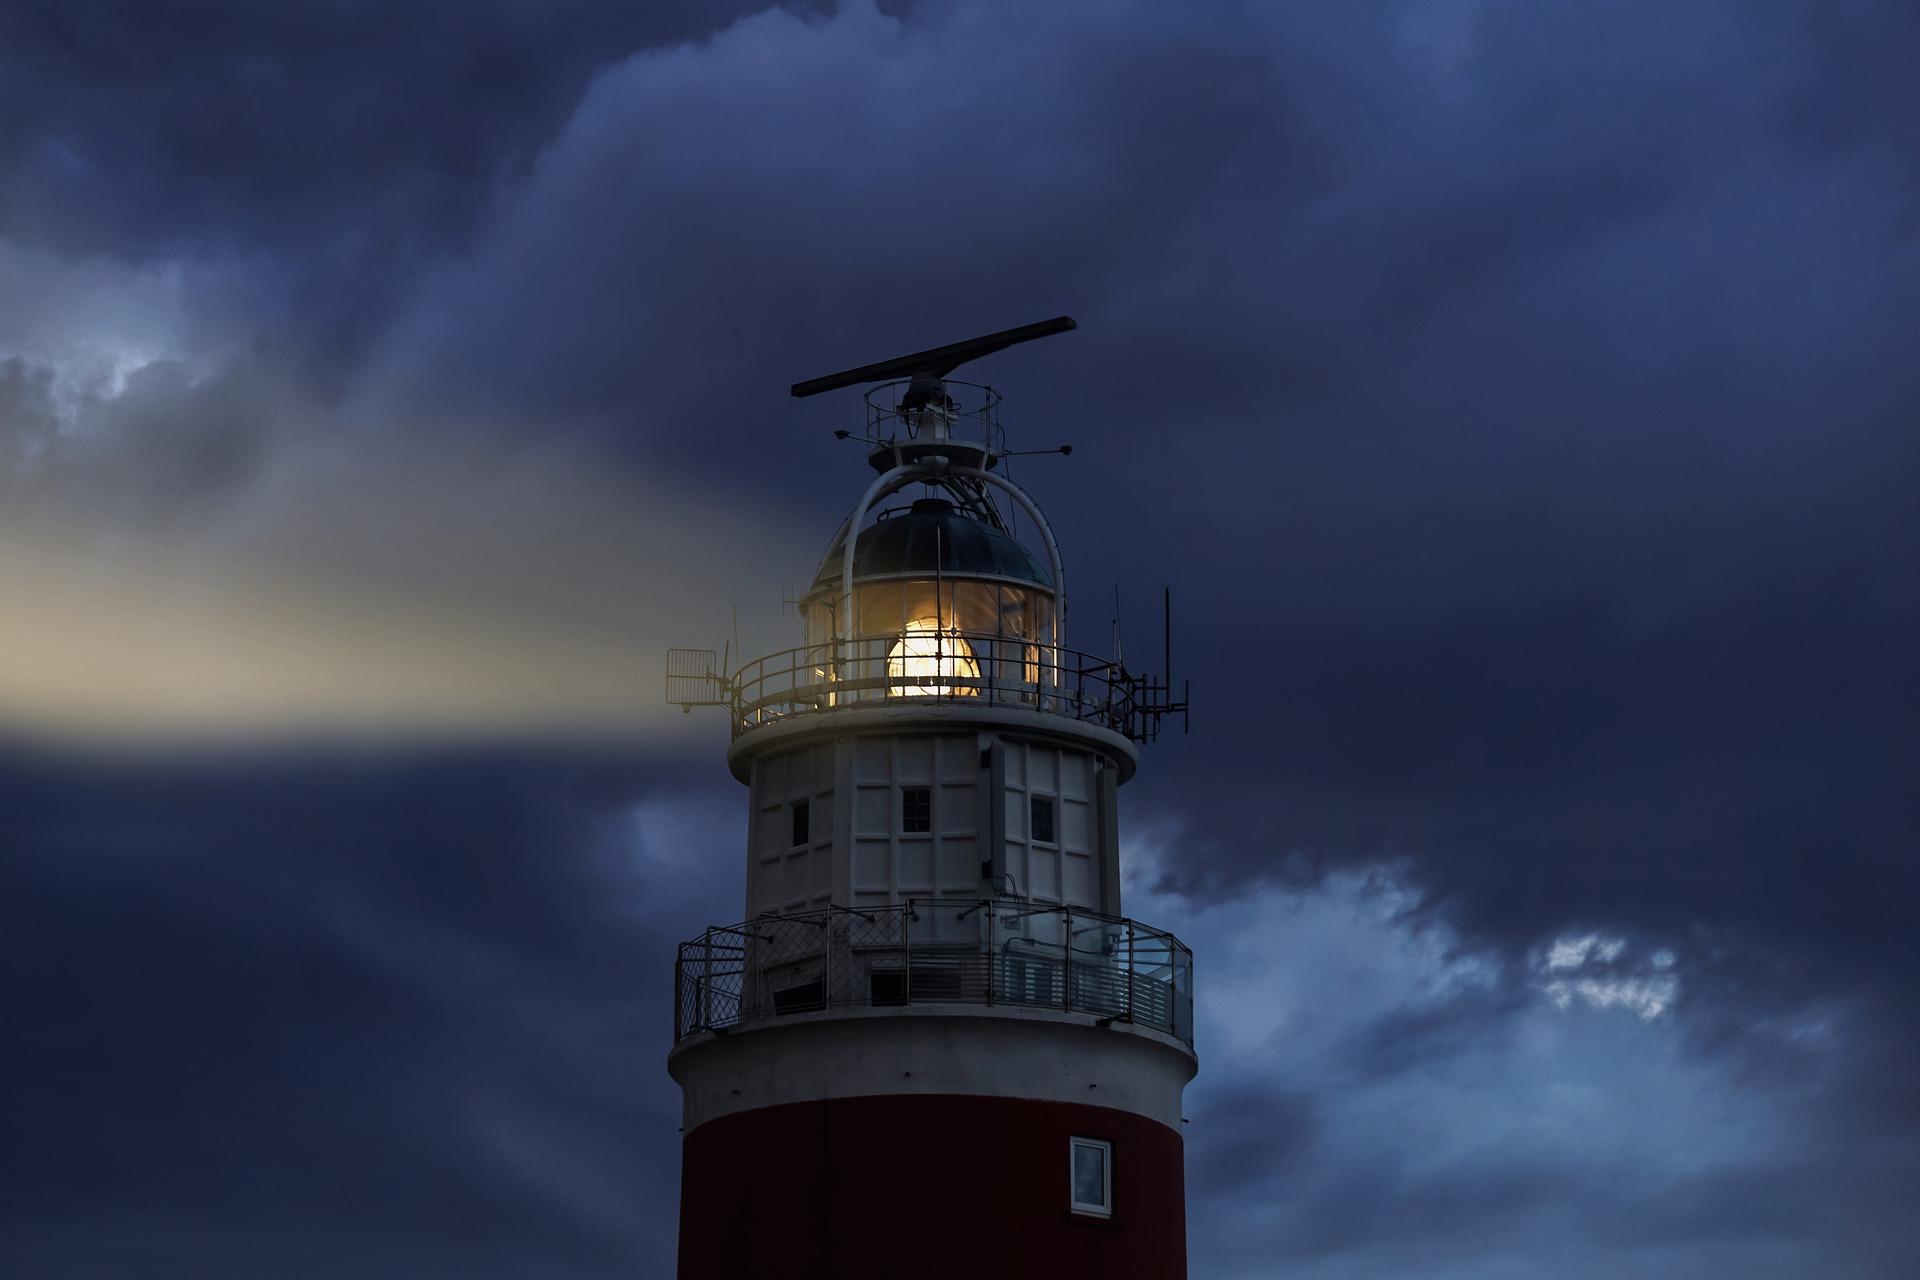 lighthouse-4846854_1920